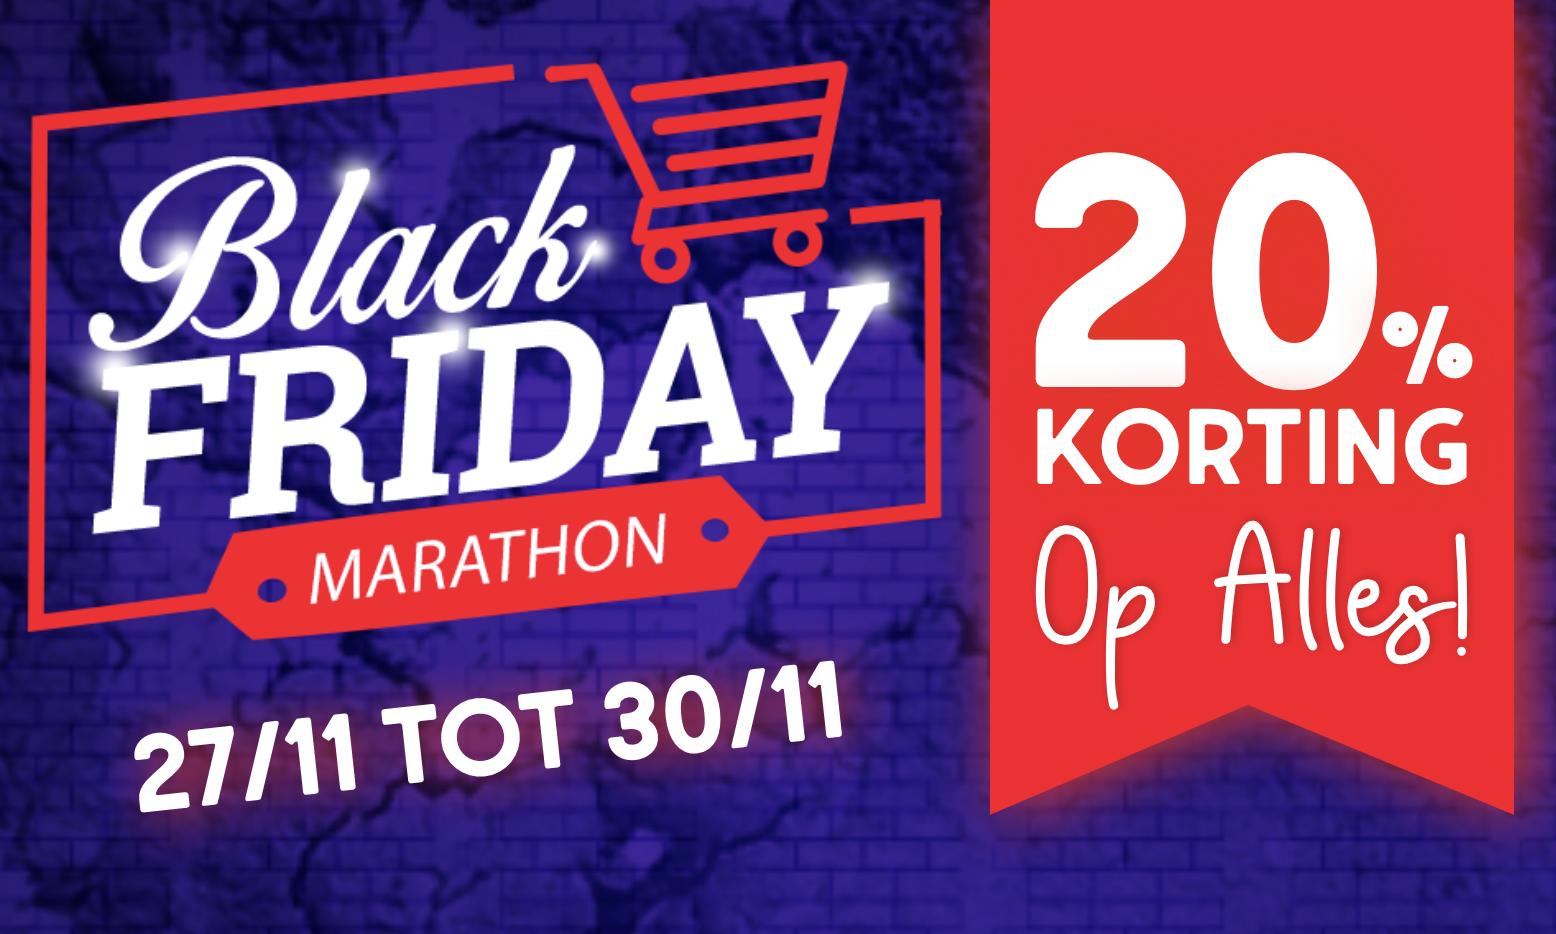 Black Friday Marathon